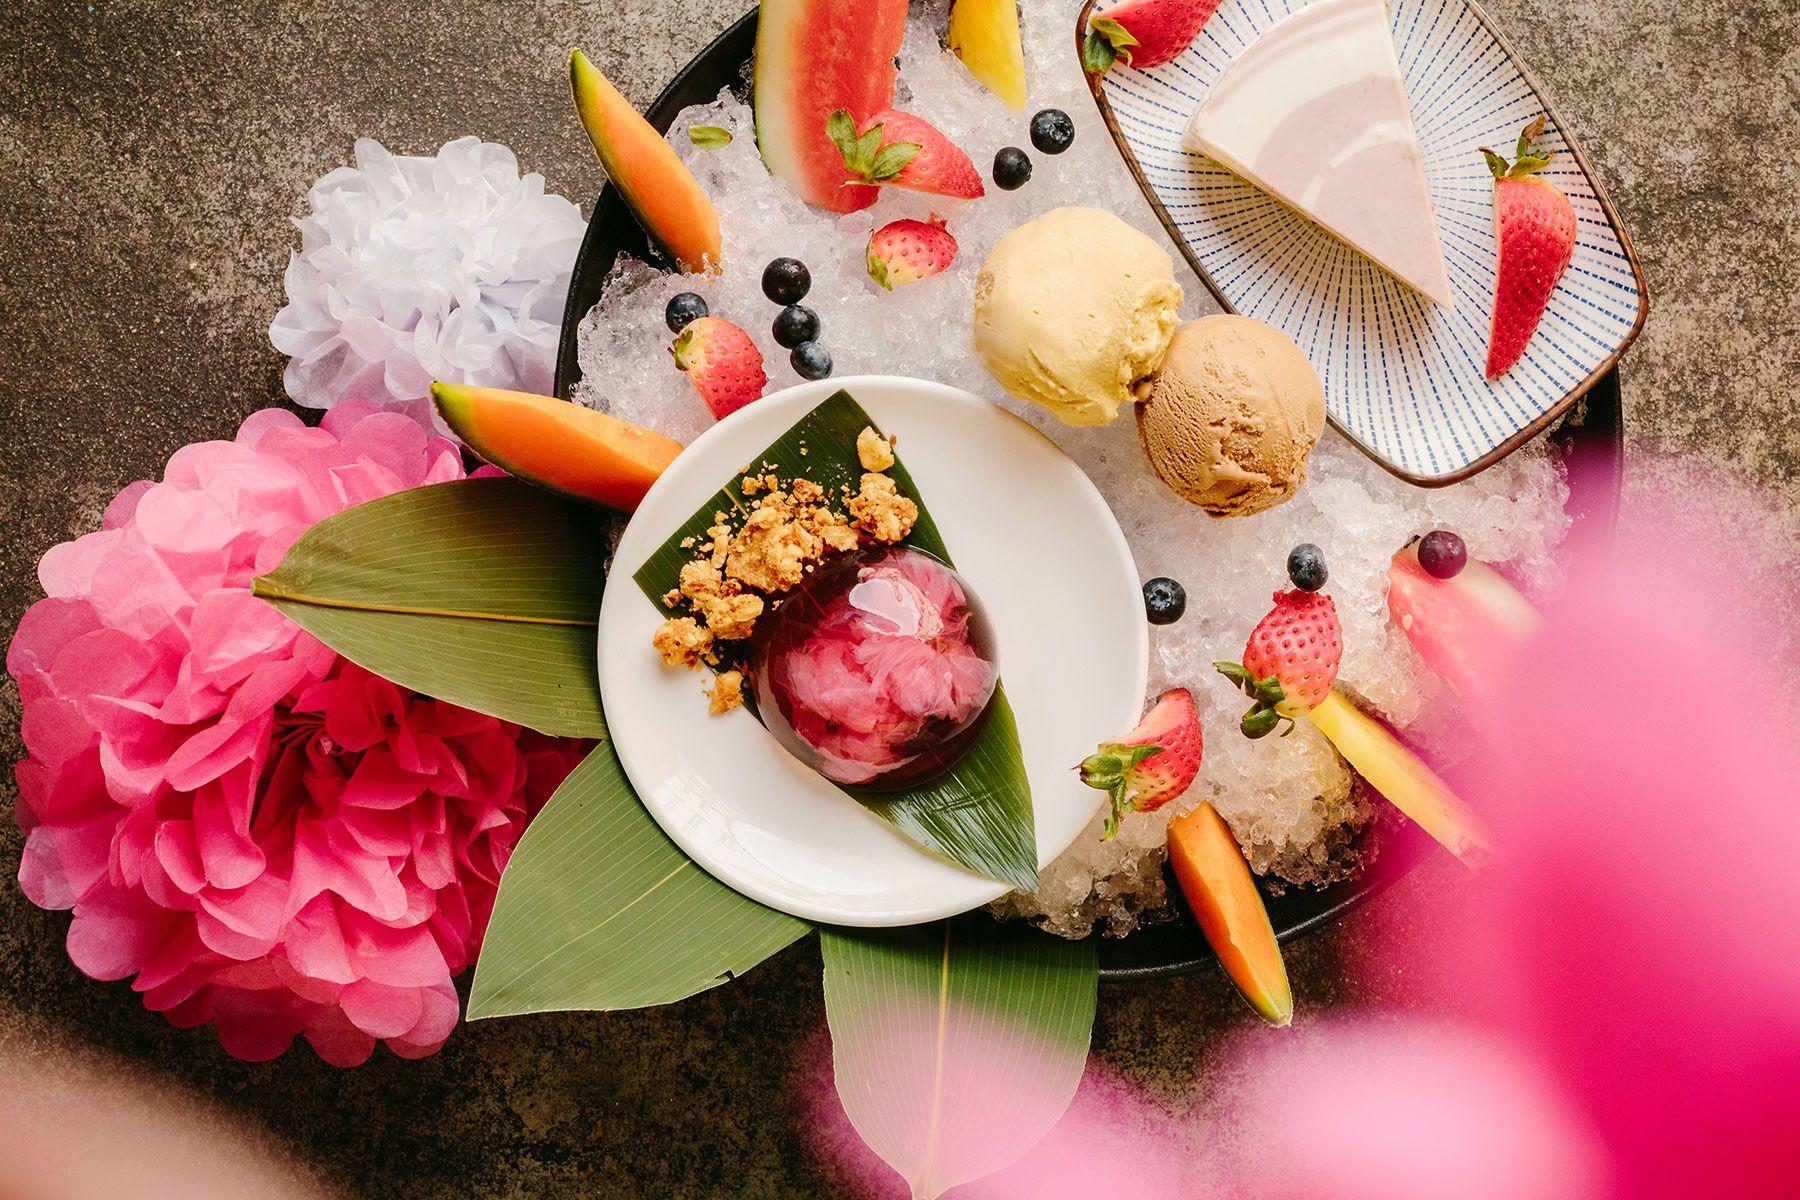 Flower Power: Where To Get A Taste Of Sakura Season In Hong Kong This Spring